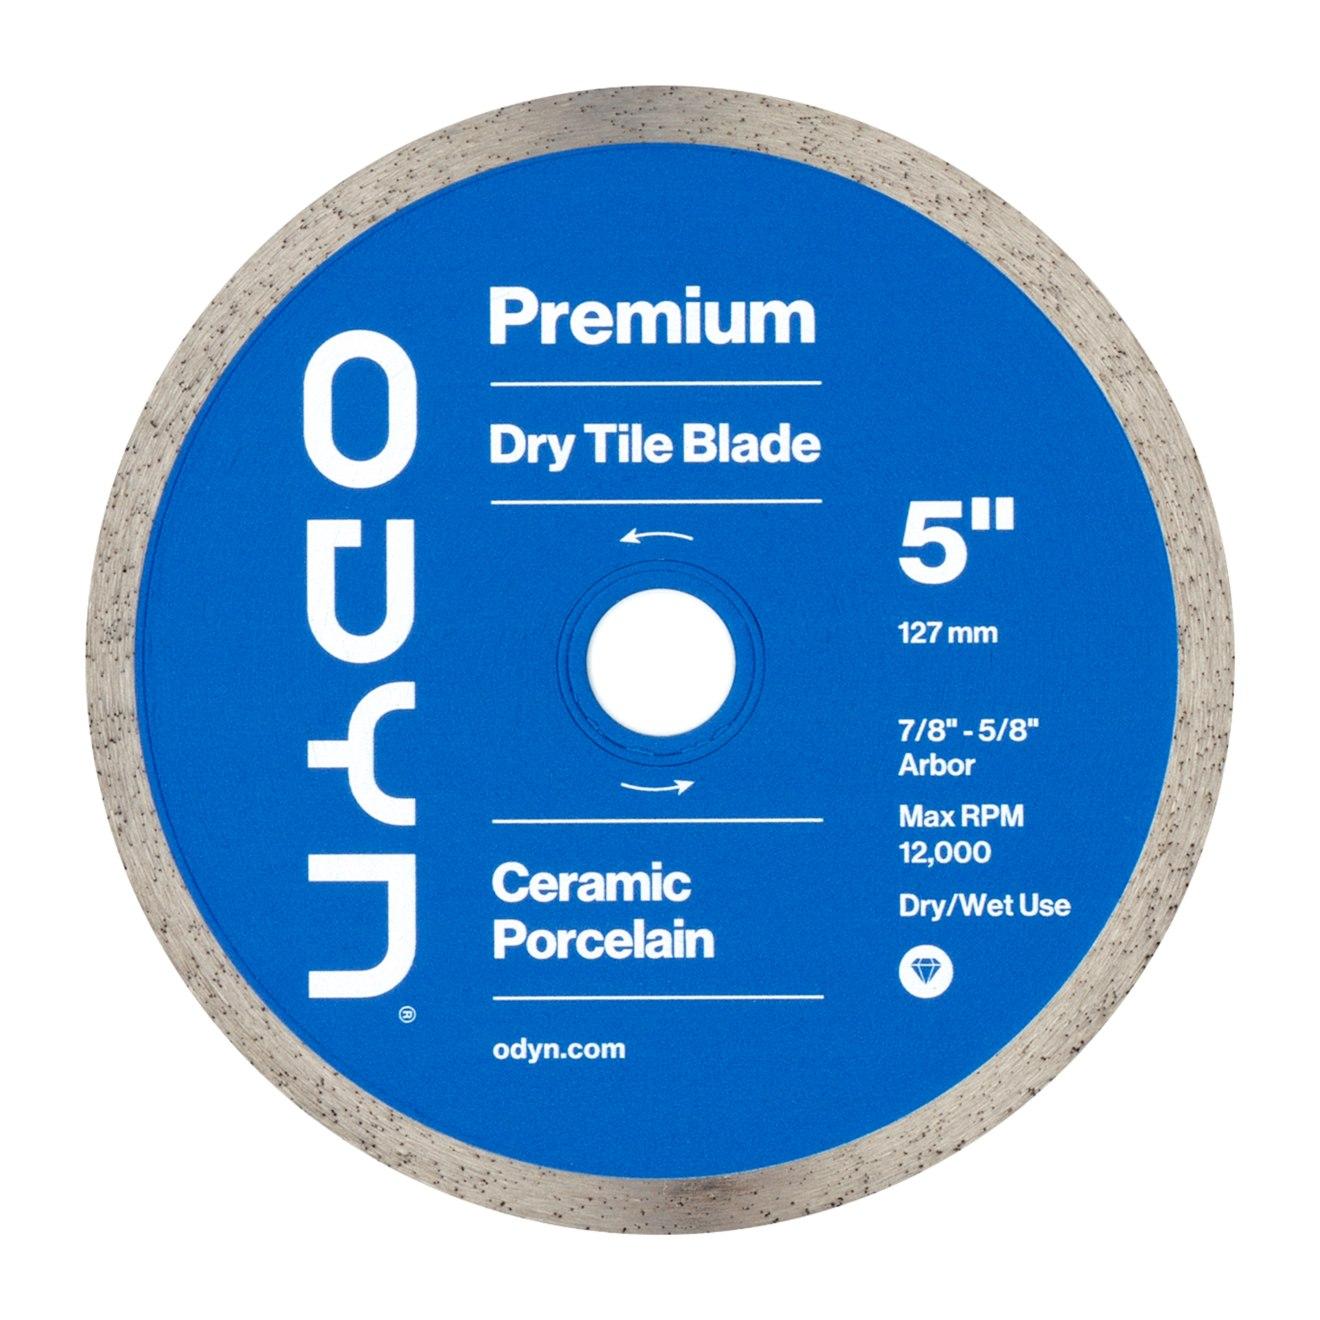 Odyn 5 in. Premium Dry Tile Blade